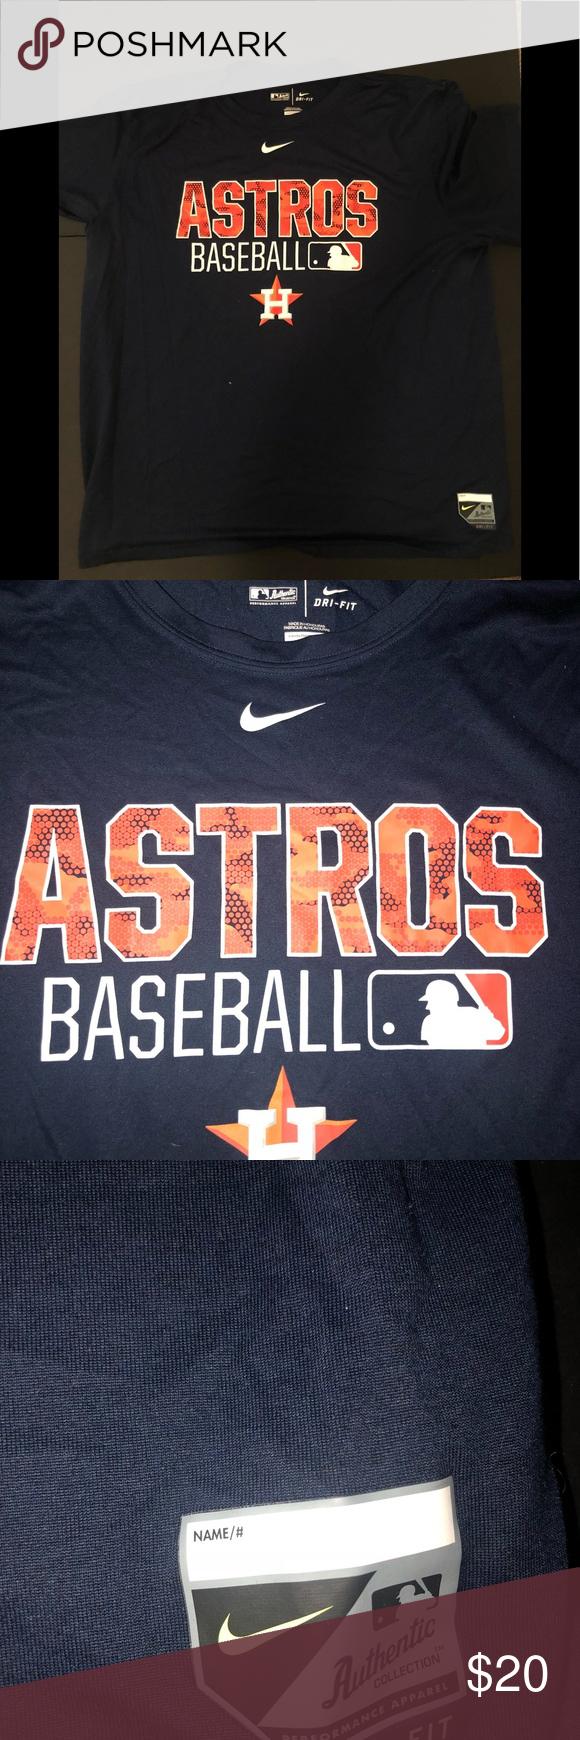 Nike Dri Fit Houston Astro Mlb Blue T Shirt 81 Blue Tshirt Nike Dri Fit Nike Shirts [ 1740 x 580 Pixel ]